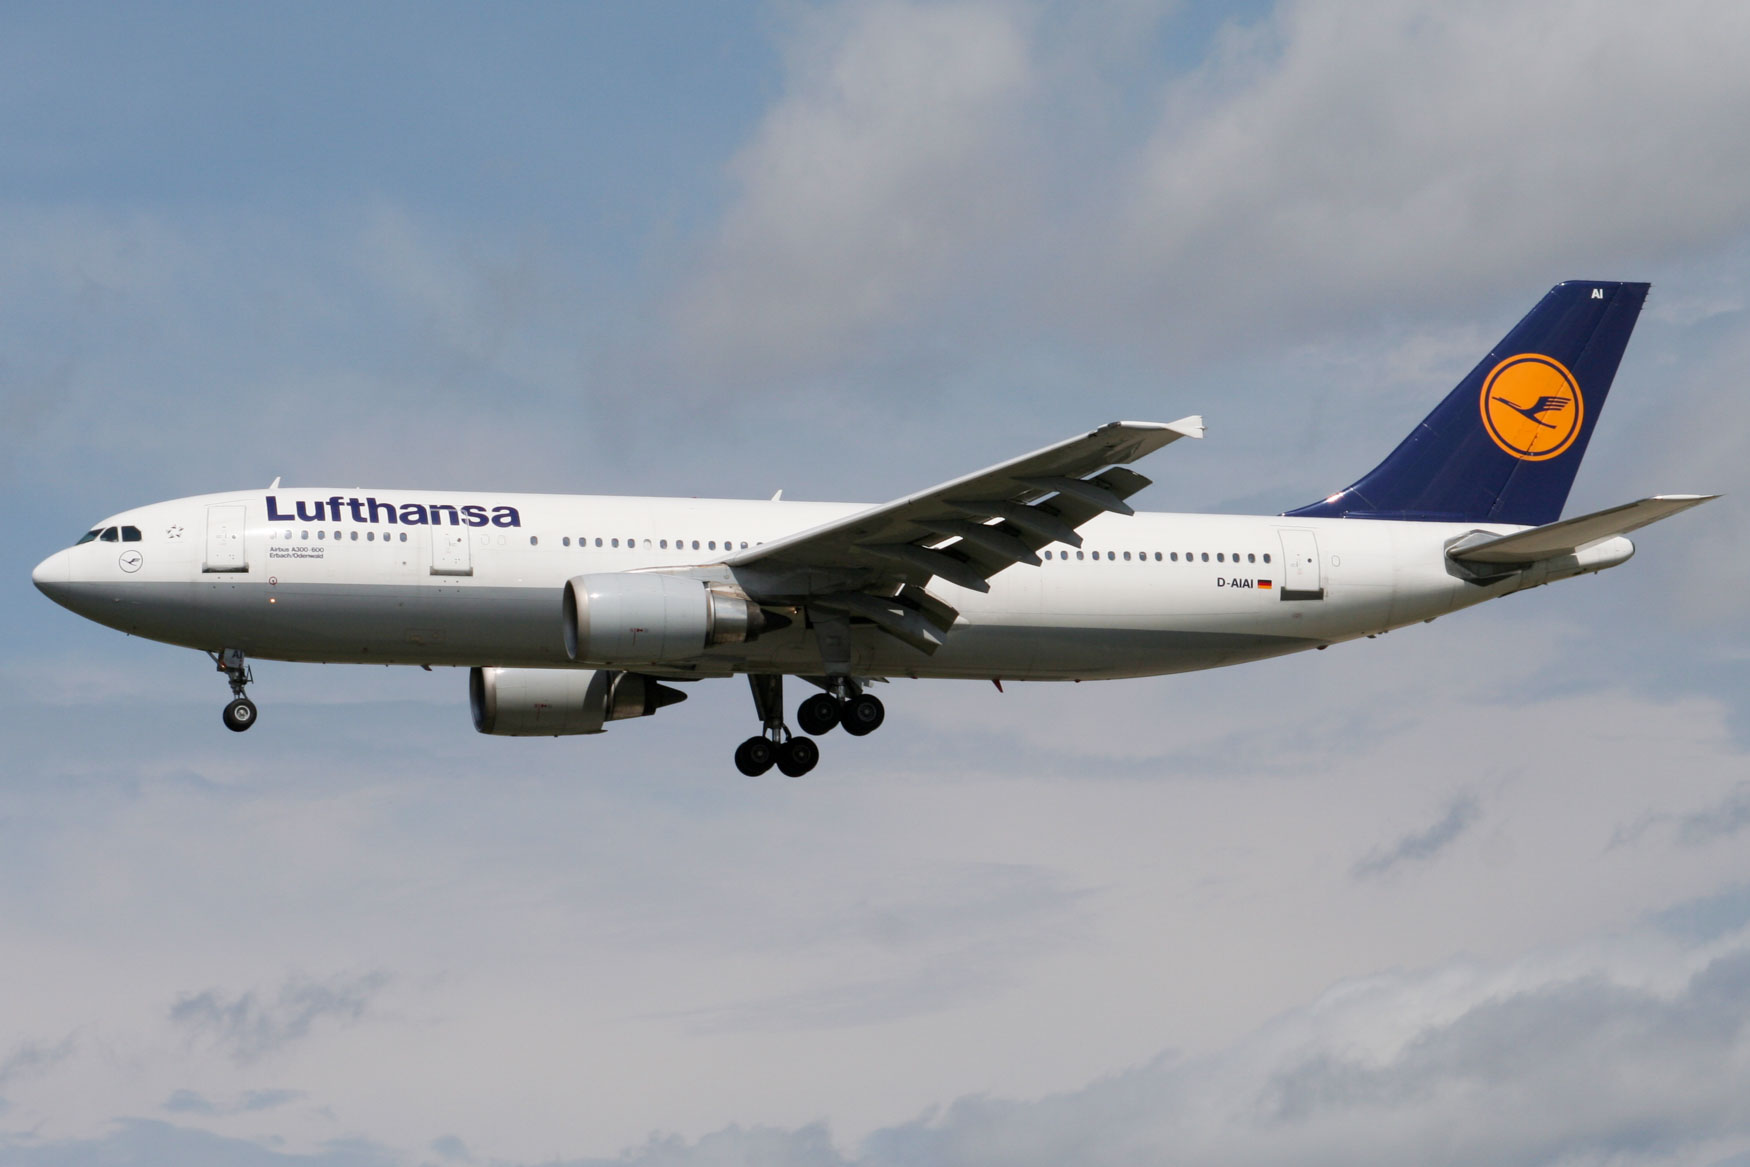 Lufthansa A300 at Frankfurt